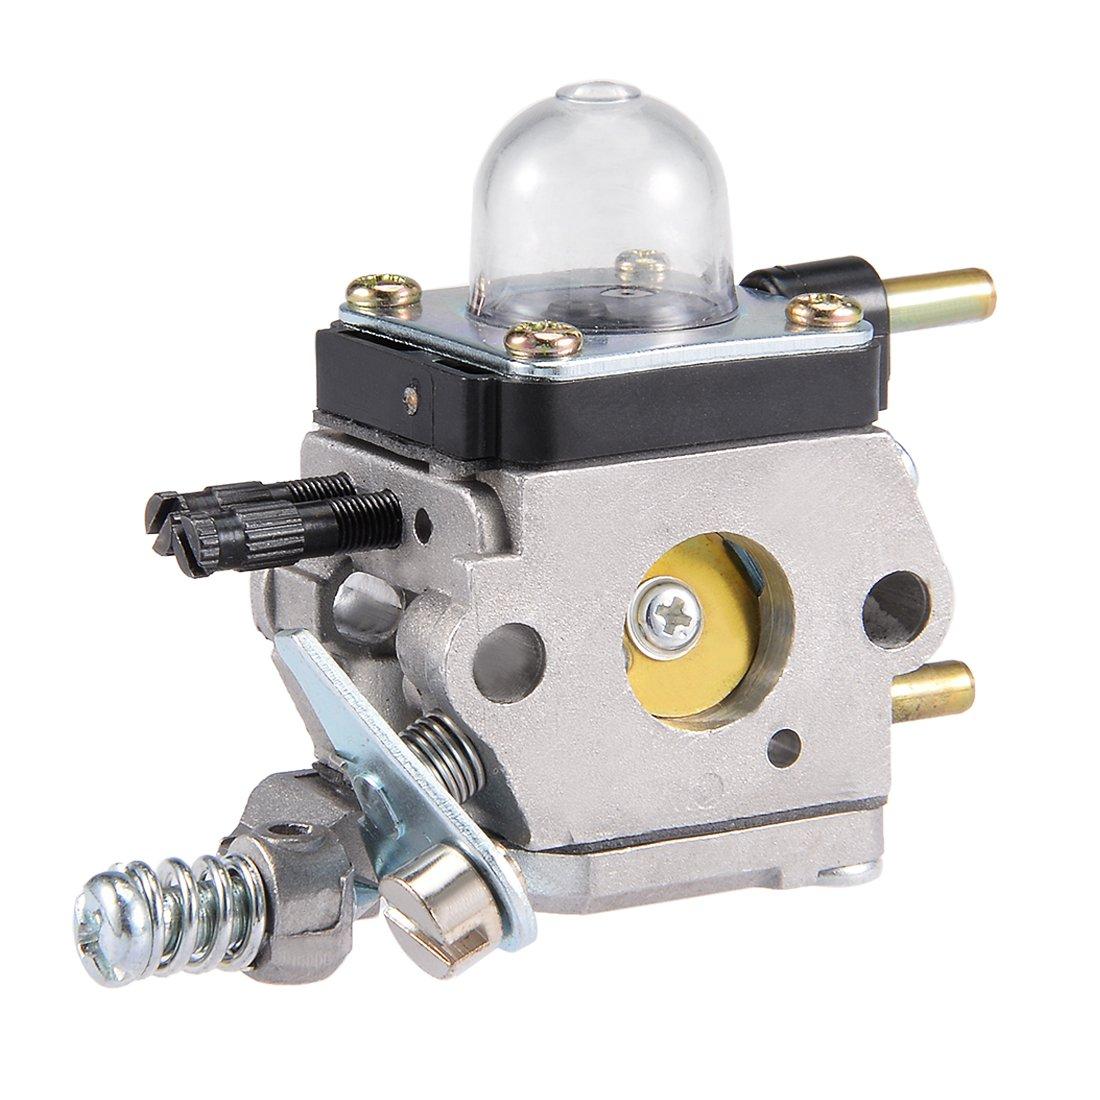 uxcell/® New Carburetor Carb for ZAMA C1U-K54A//K54 C1U-K27B Fits Echo Mantis Tiller 7222 7222E 7222M TC210 TC2100 LHD1700 HC1500